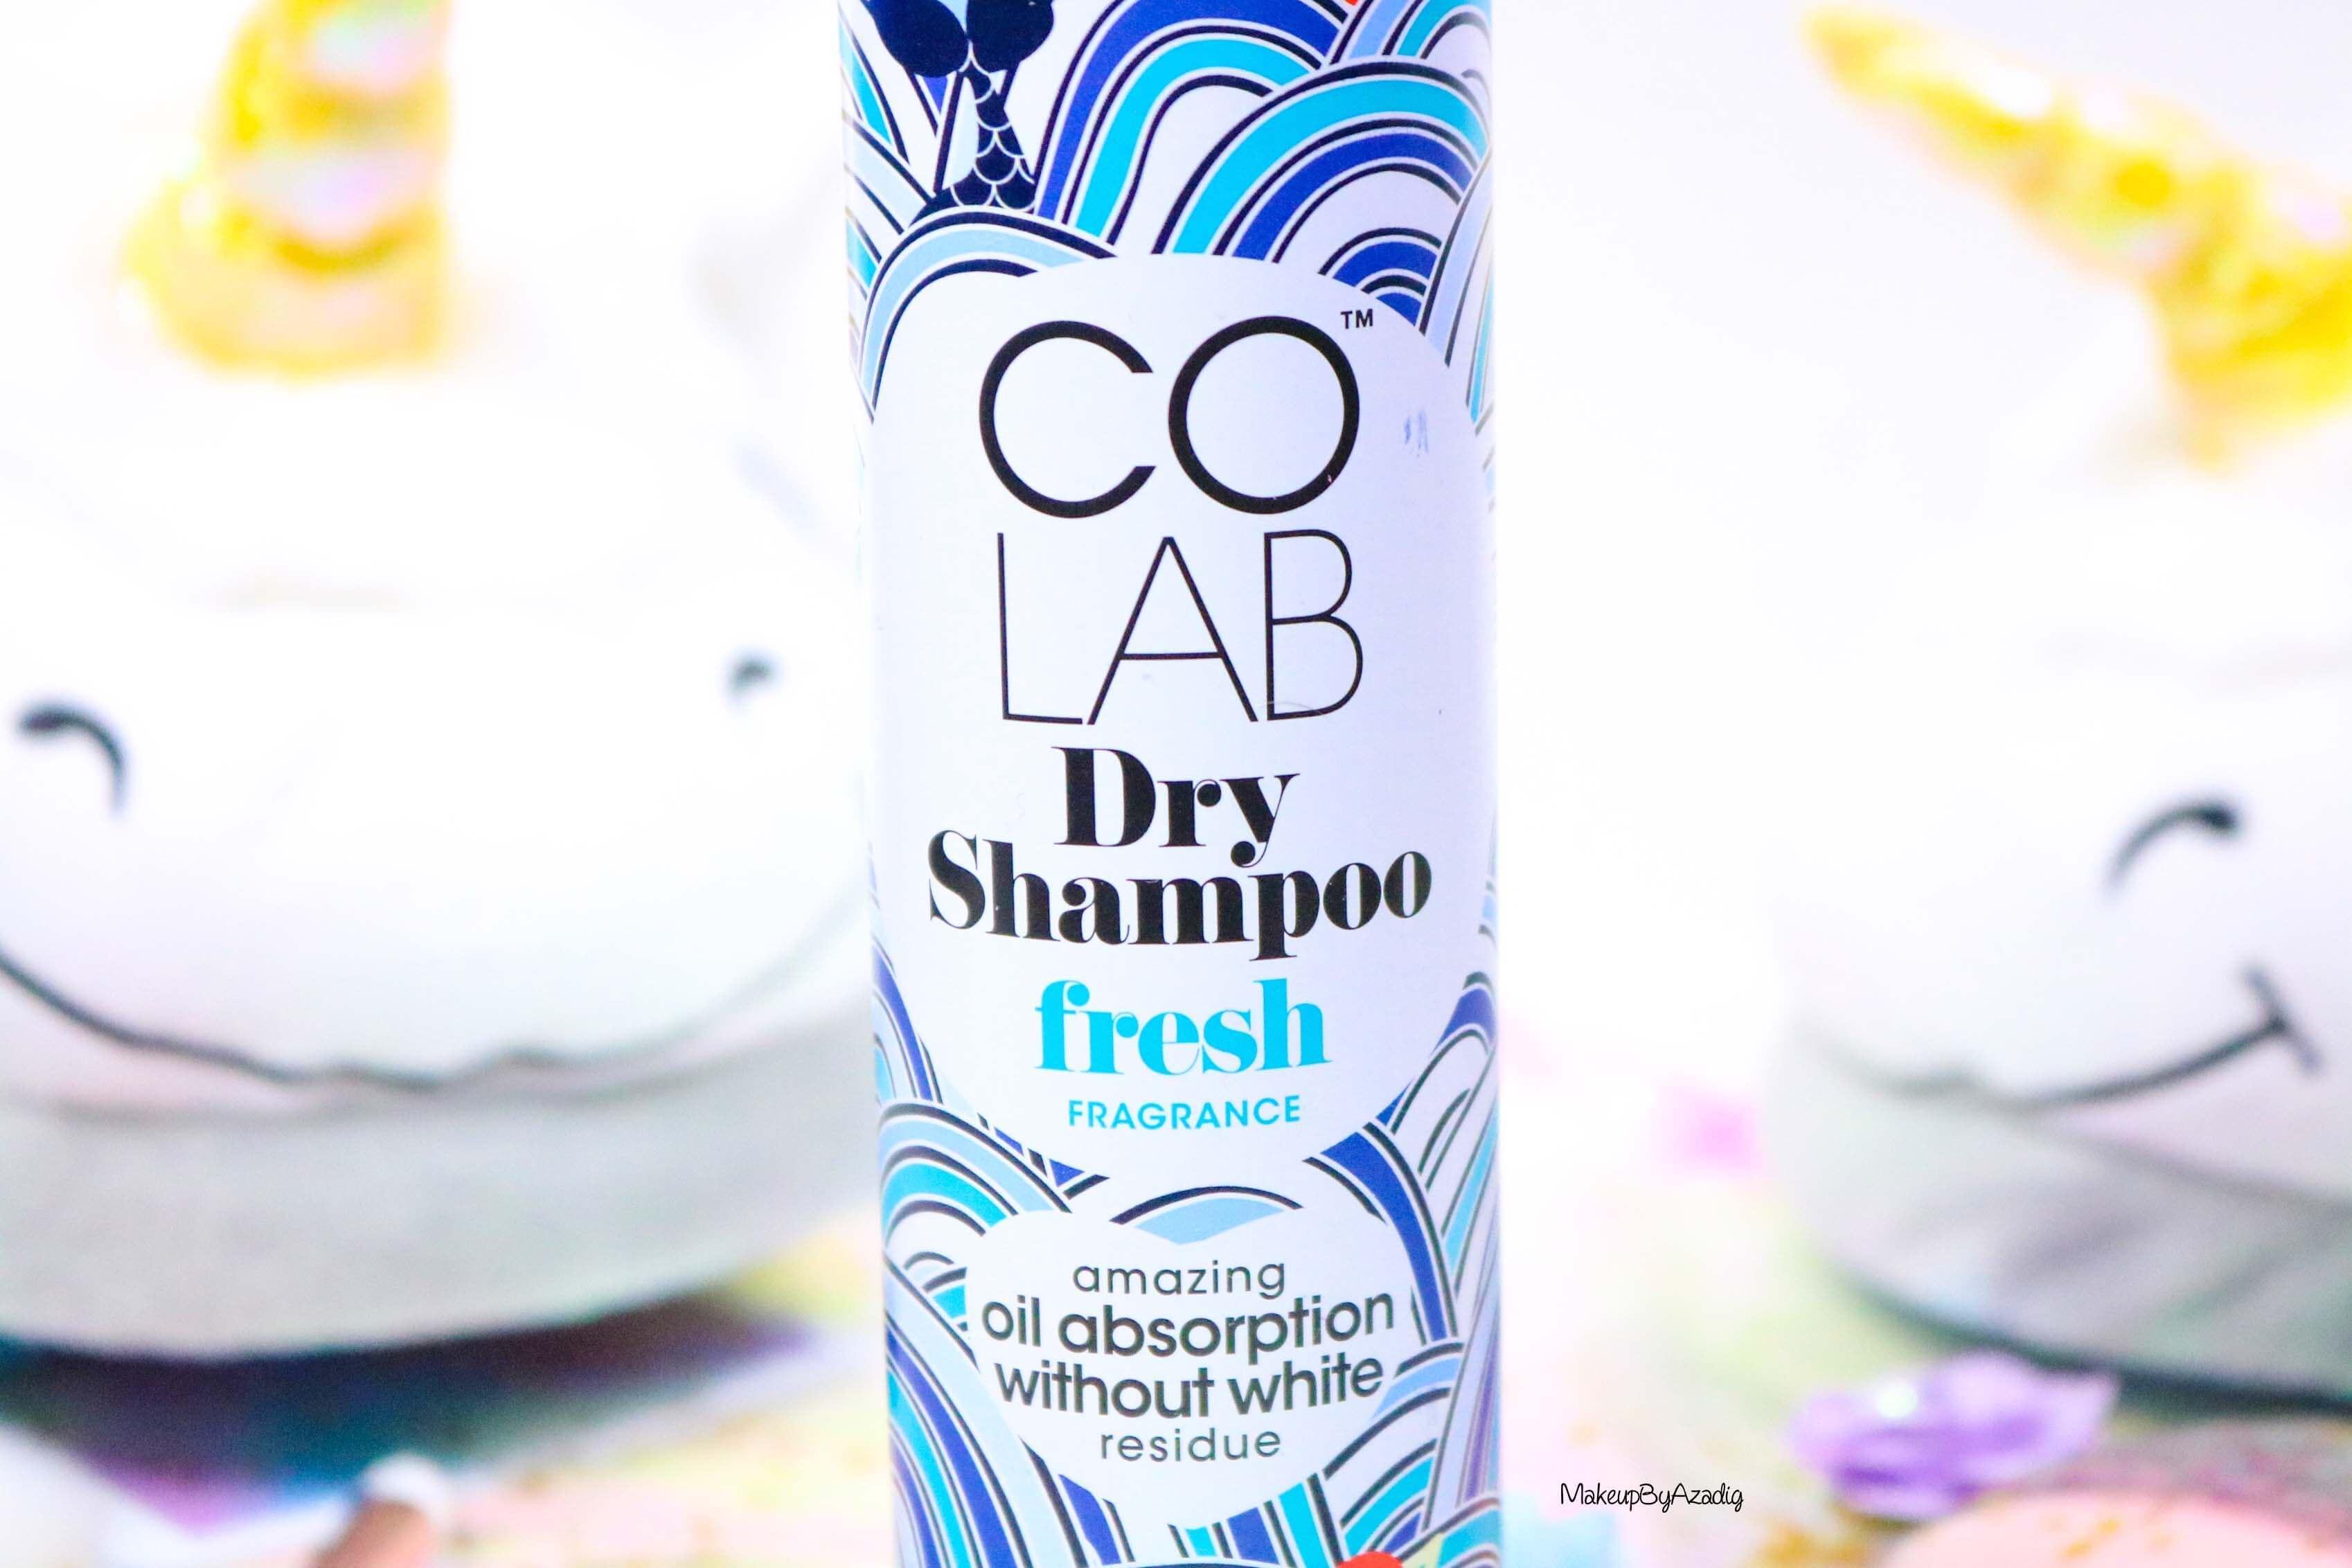 revue-shampooing-sec-colab-batiste-fresh-unicorn-monoprix-feelunique-prix-avis--soin-capillaire-efficacite-makeupbyazadig-dry